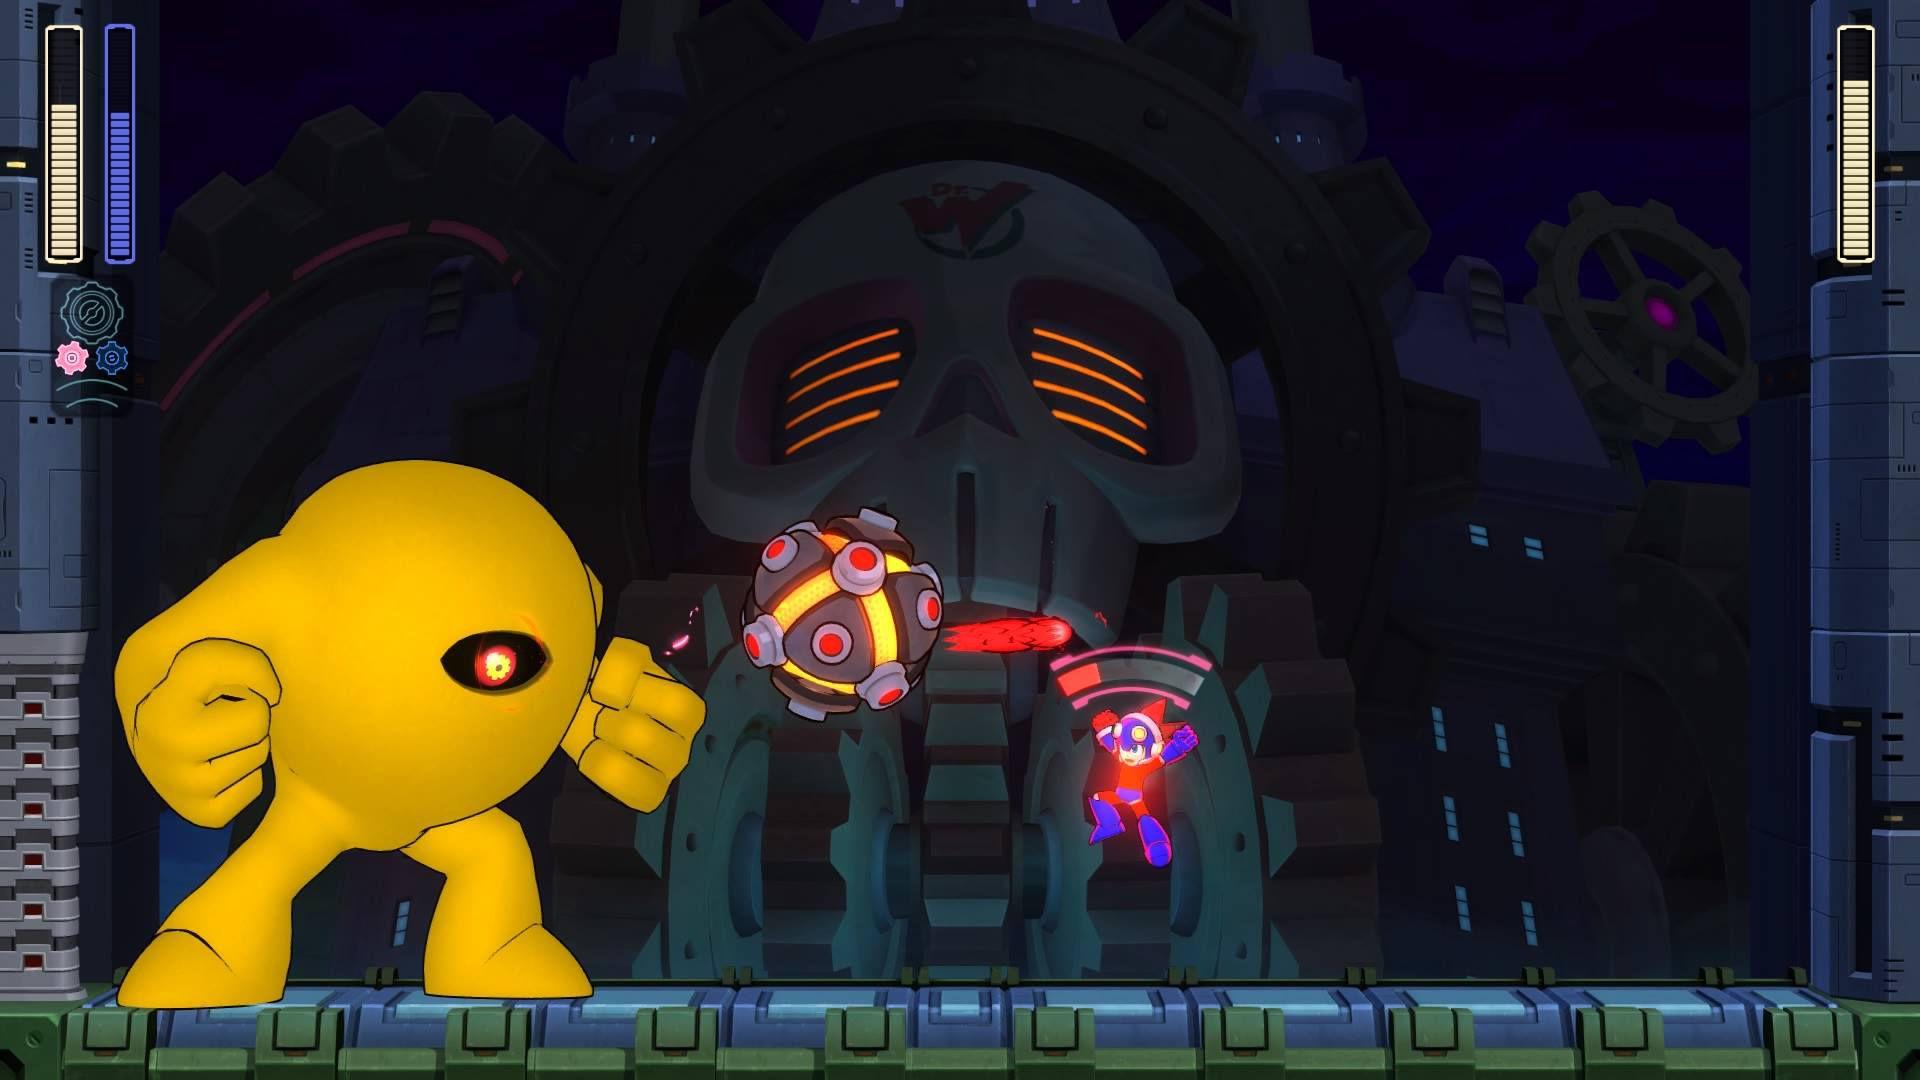 Mega Man attacks Yellow Devil in Mega Man 11